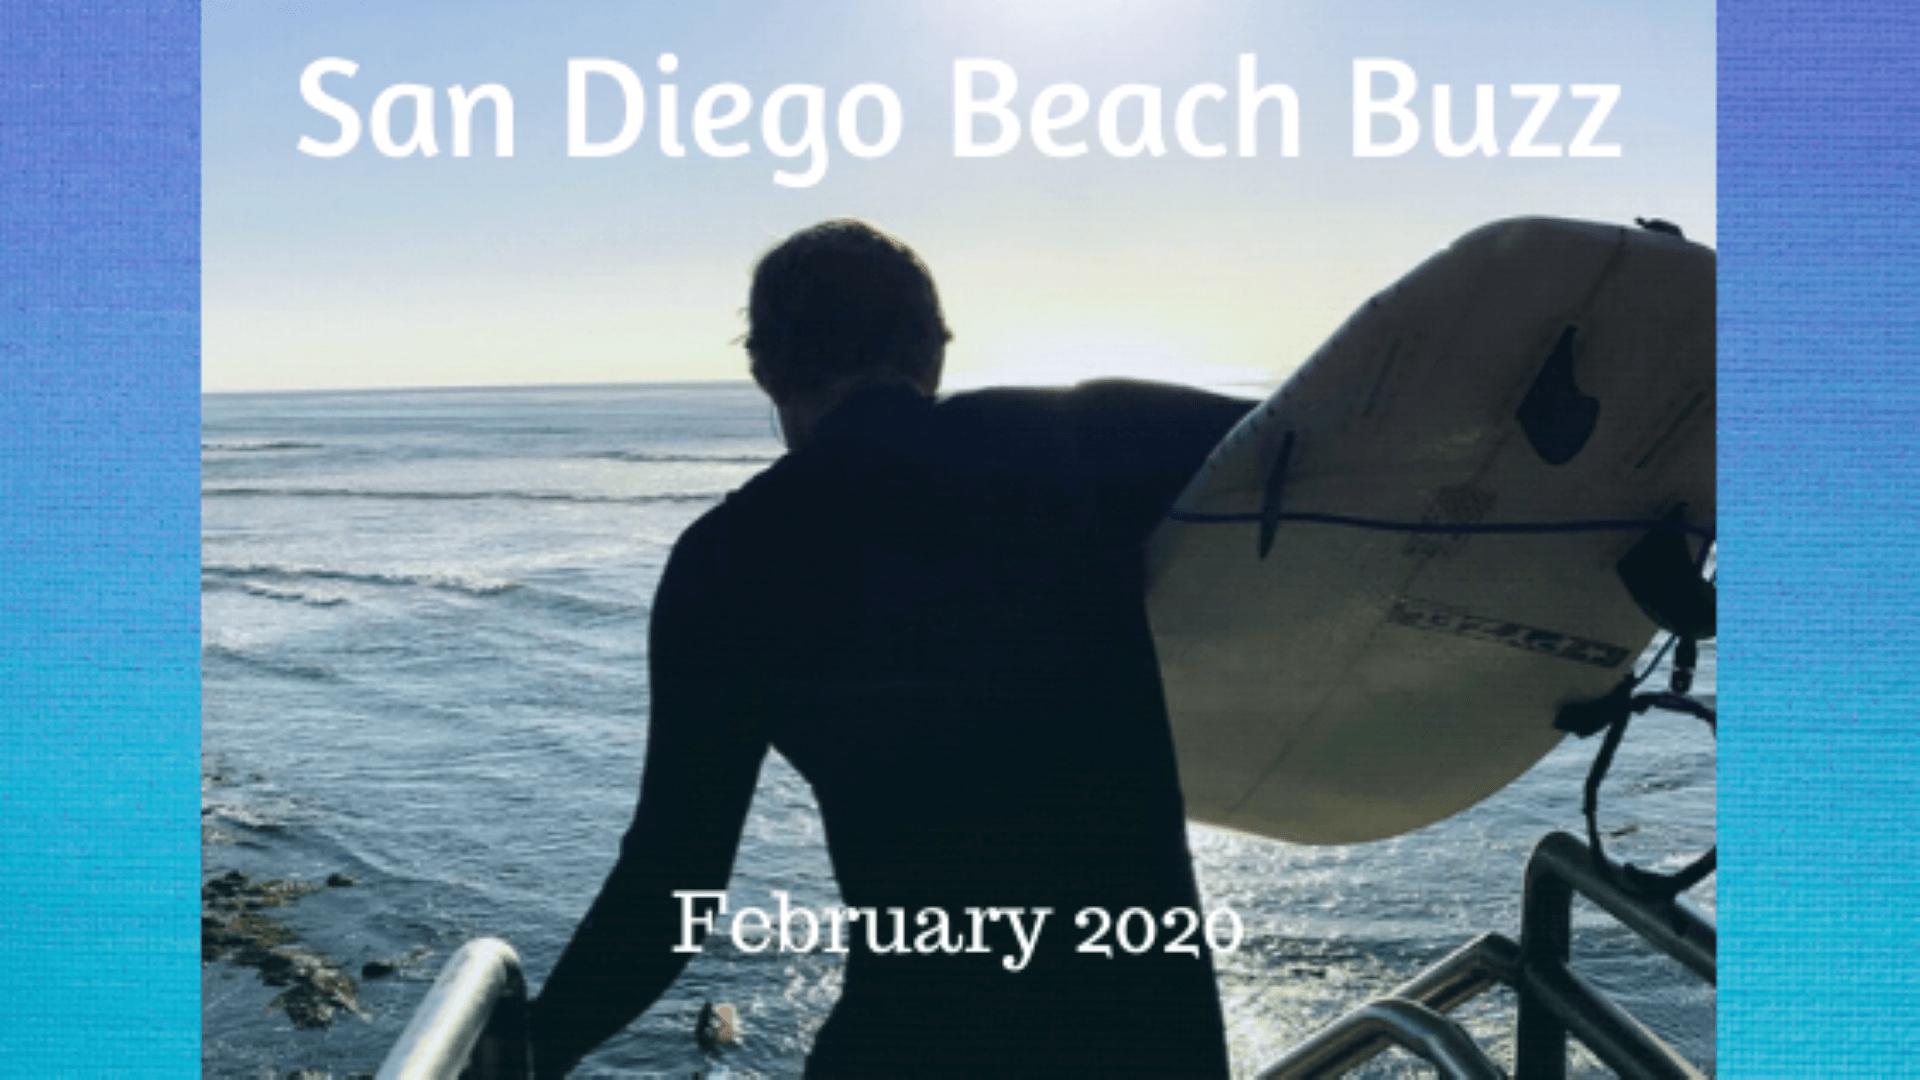 San Diego Beach Buzz February featured image